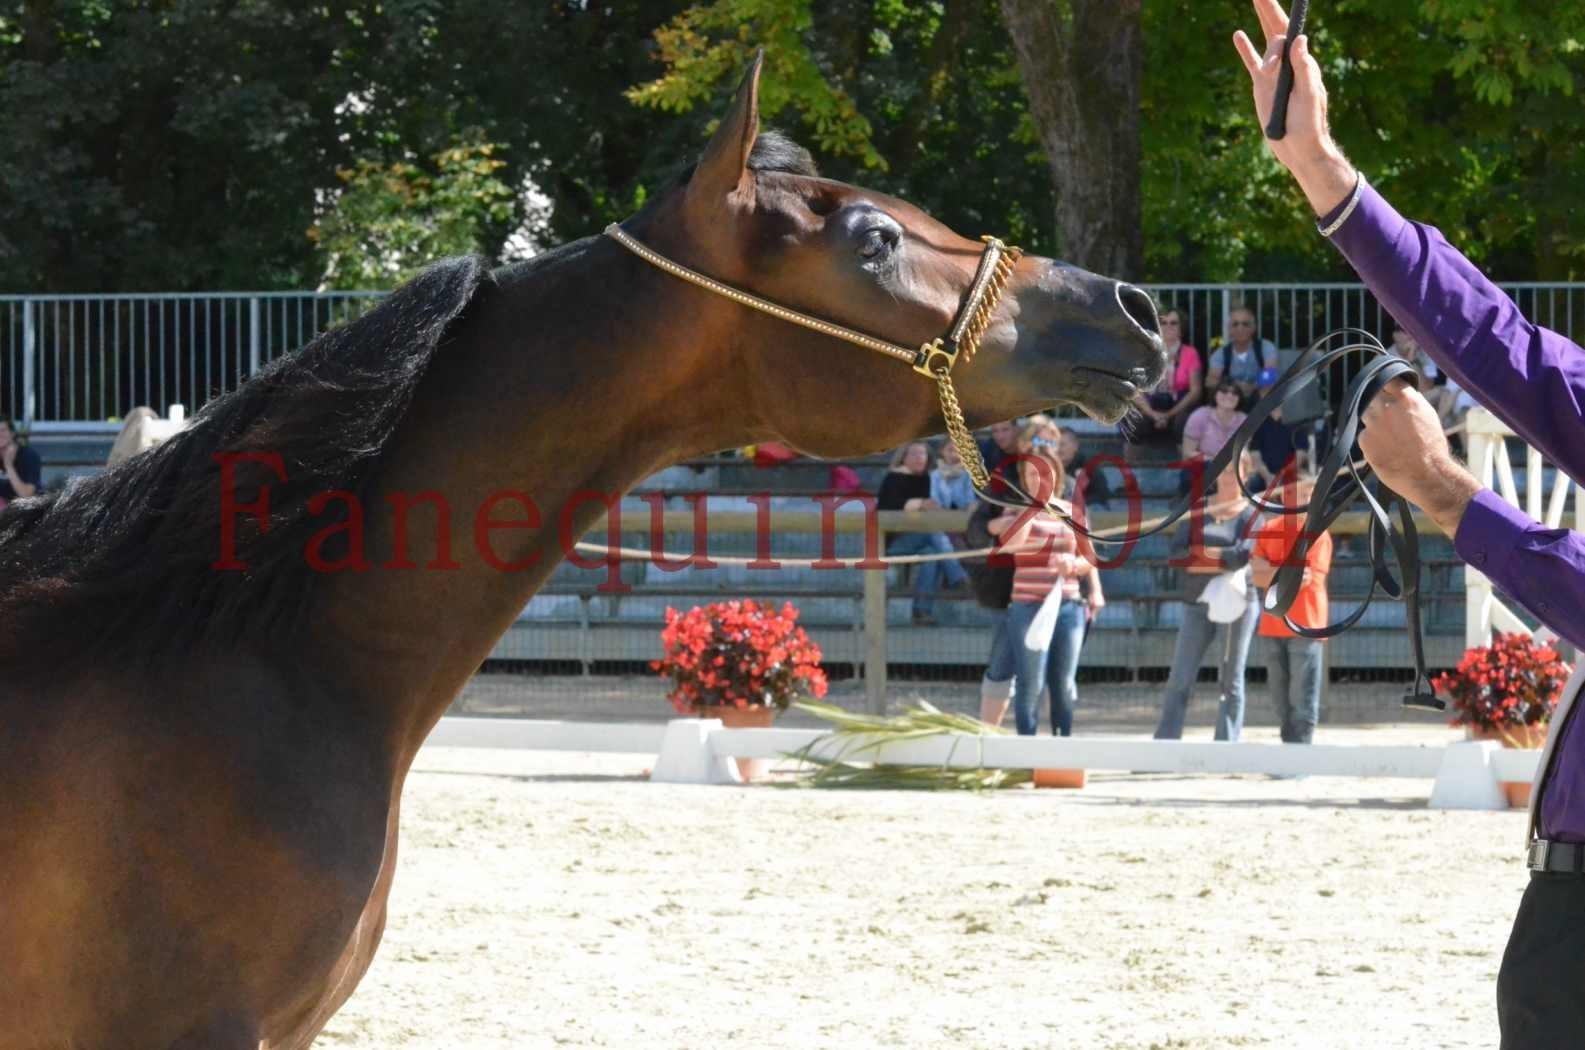 Championnat de FRANCE 2014 - Amateurs - SH FARAJAA - 49